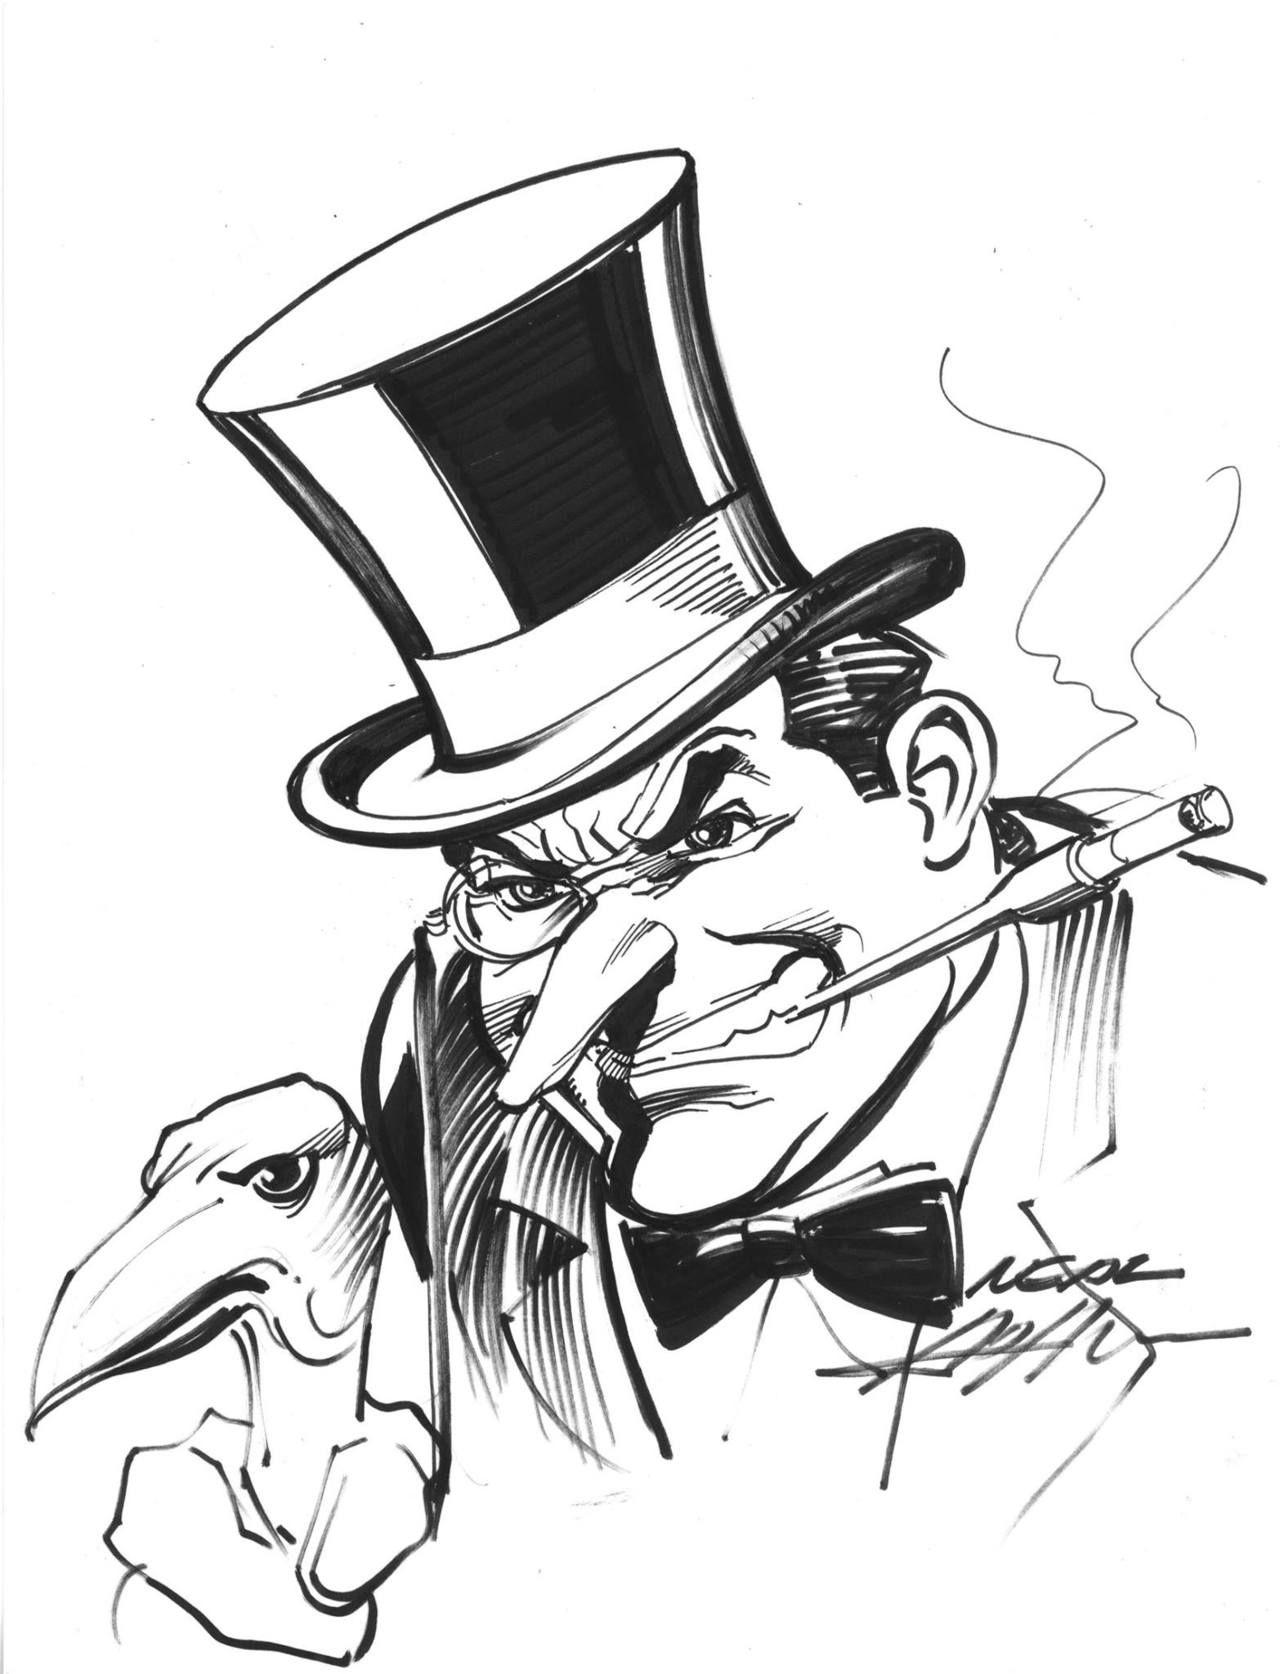 Then Penguin by Neal Adams